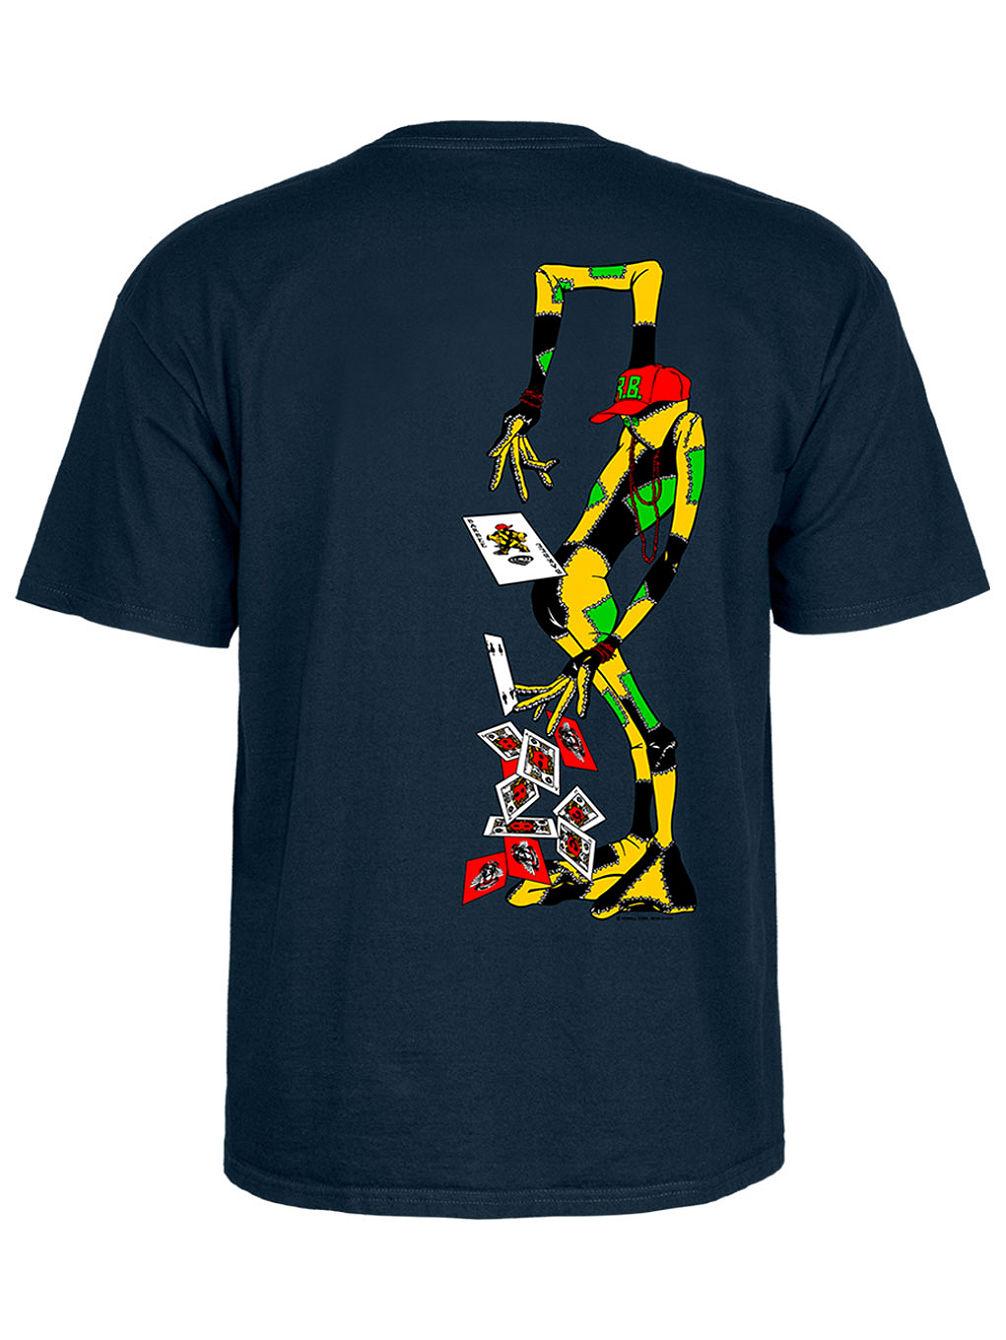 9537bf602 Ray Barbee Rag Doll T-Shirt